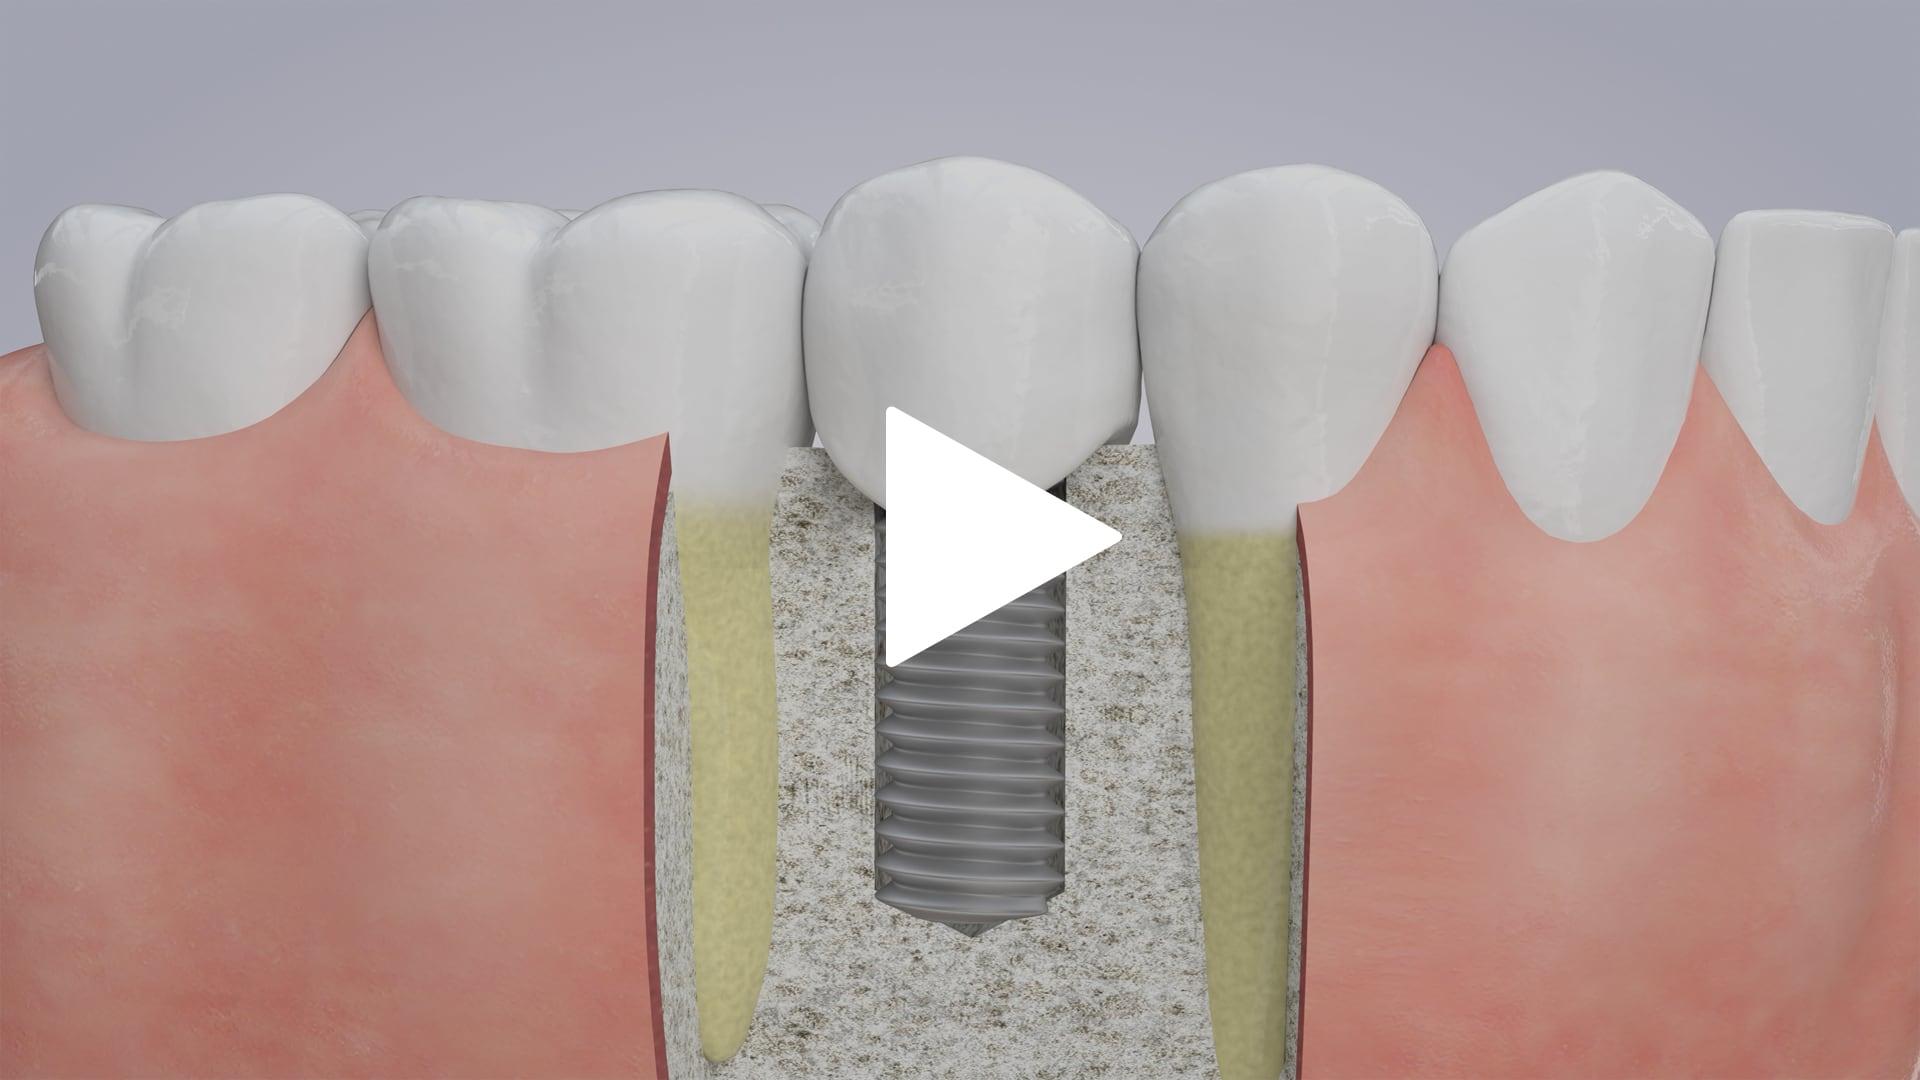 Dental Implants (Single)